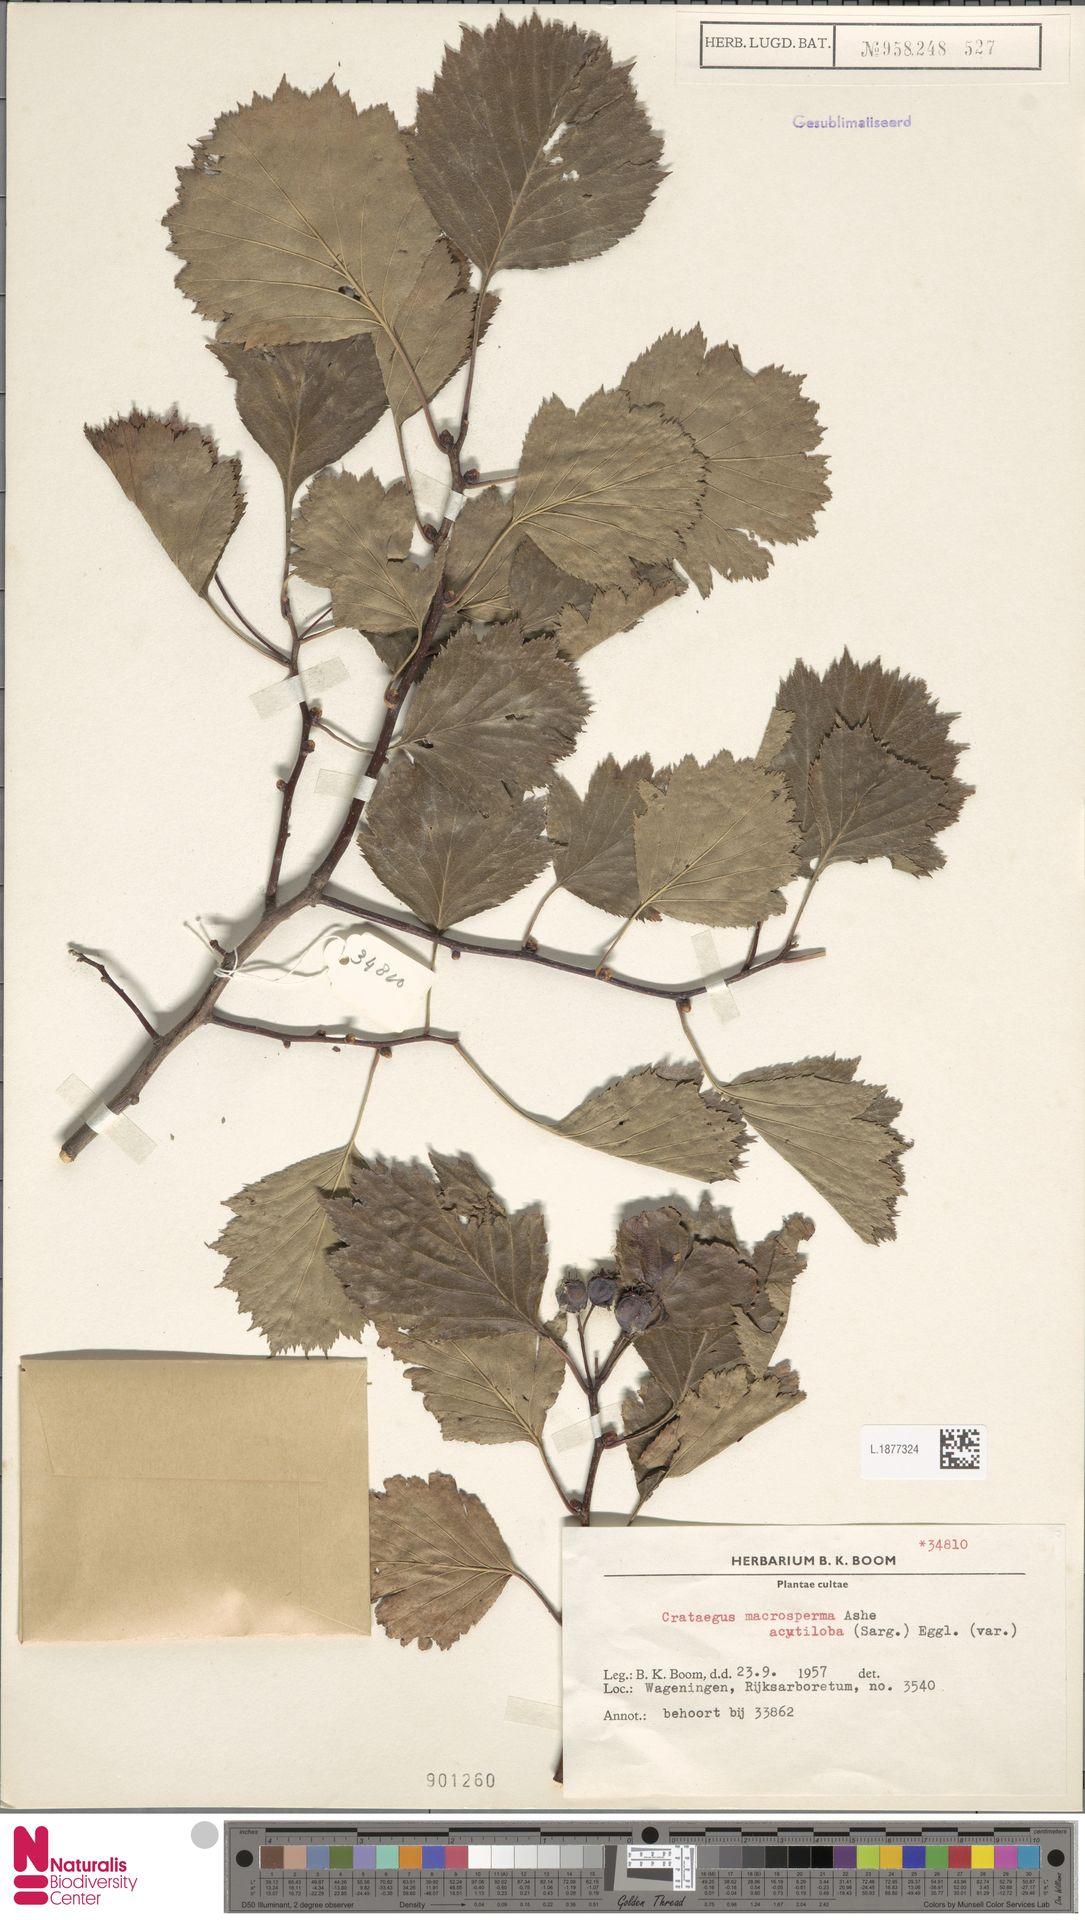 L.1877324 | Crataegus macrosperma Ashe